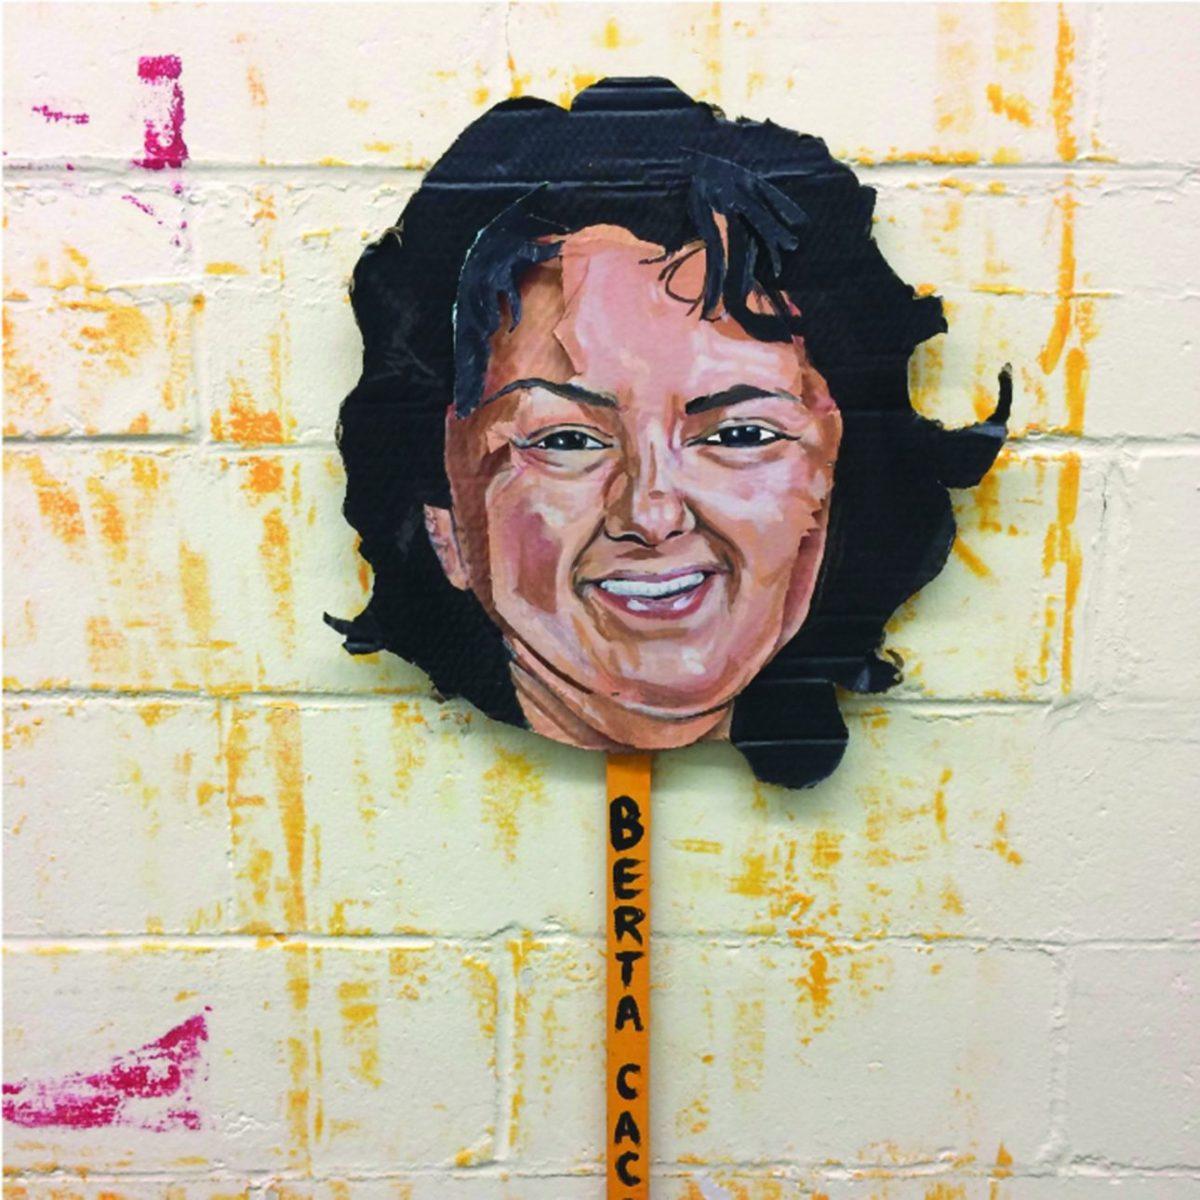 Cardboard rendering of Berta Cáceres